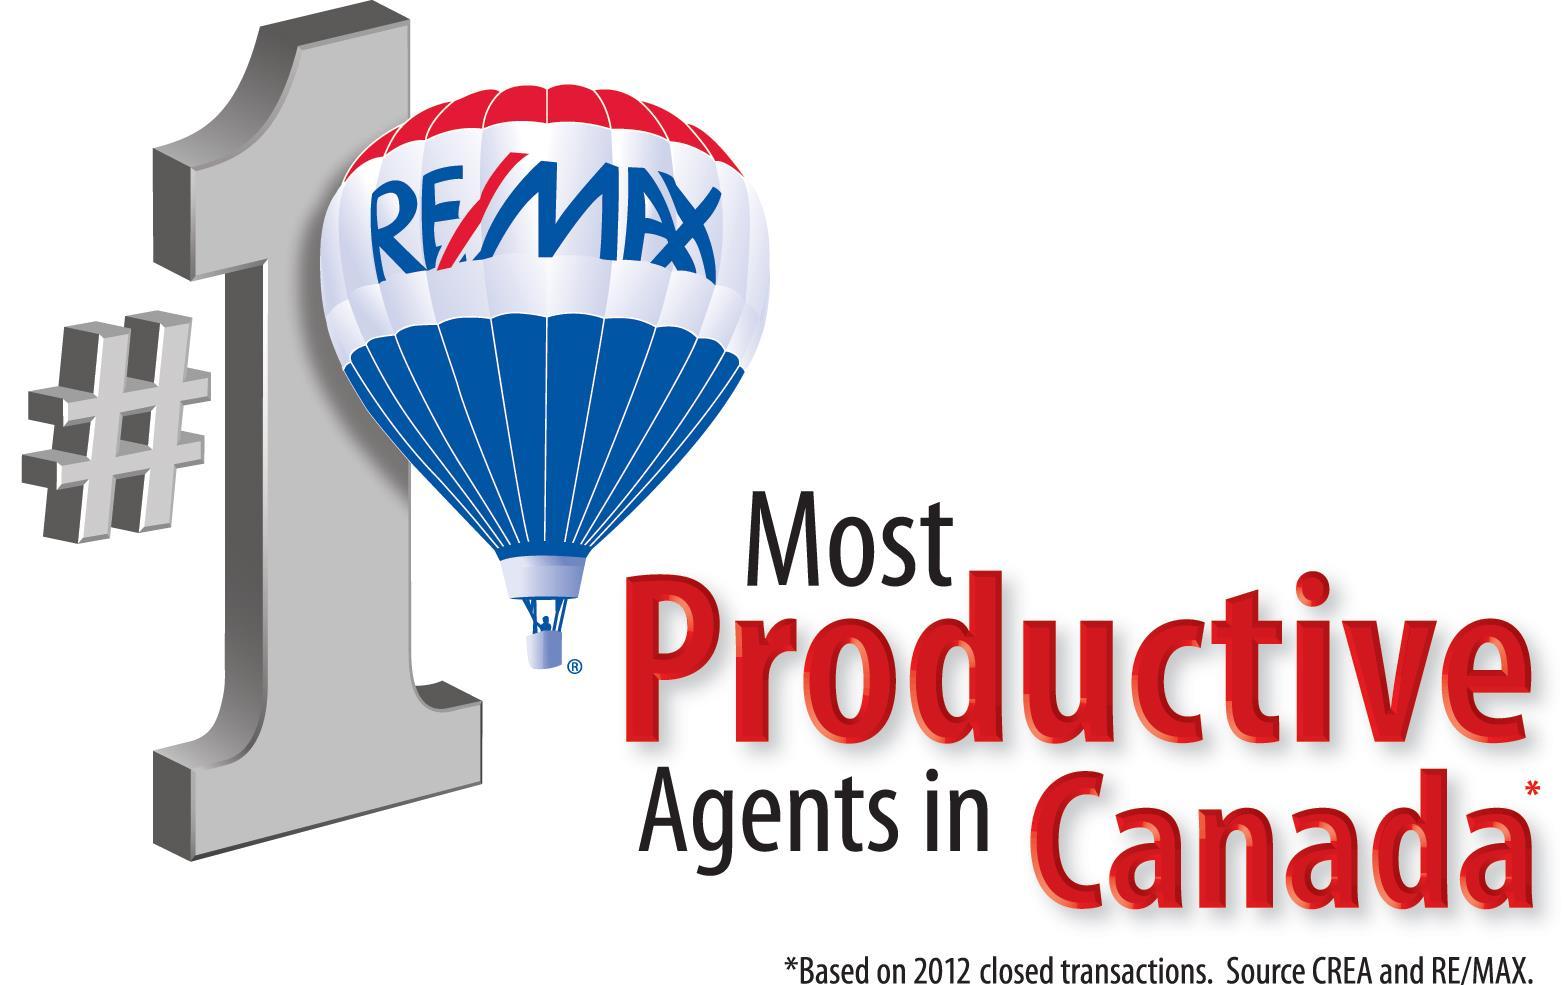 Most productive Realtors in Canada - RE/MAX